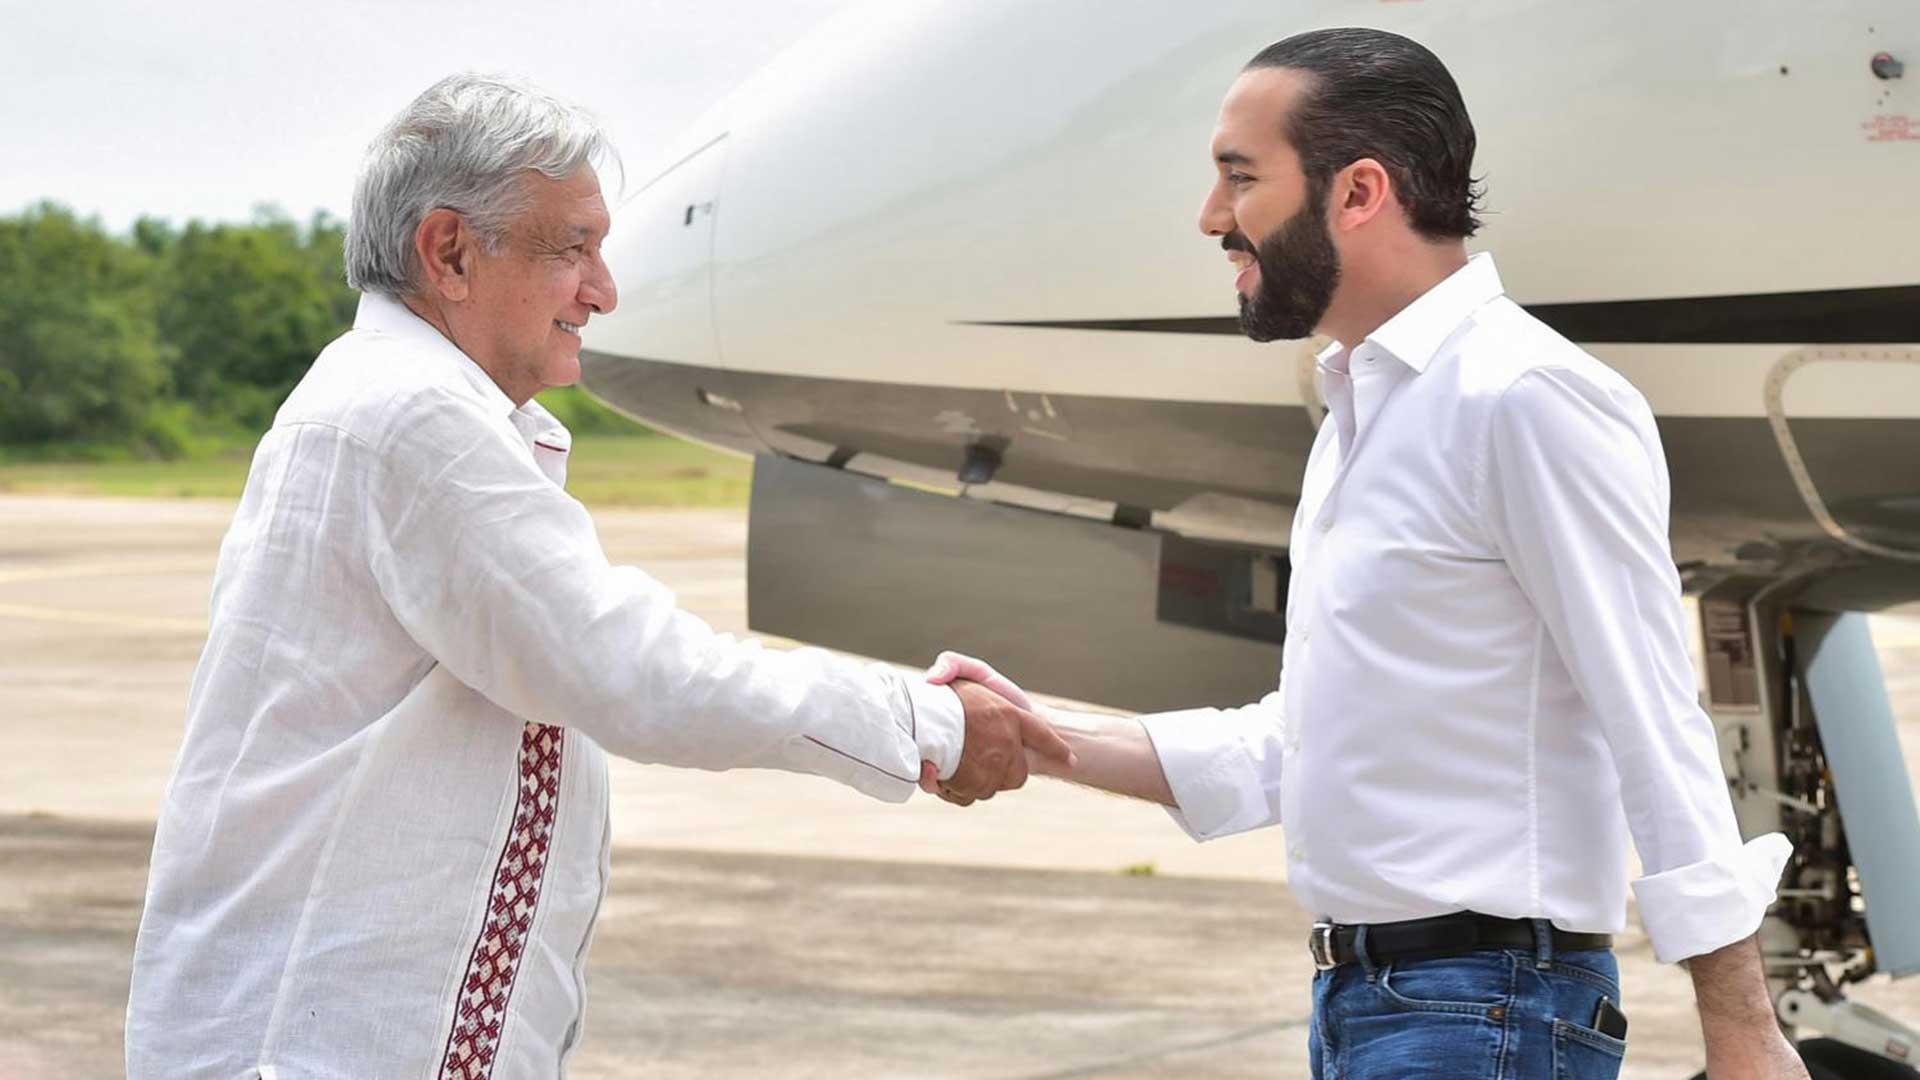 Mexcio President Andrés Manuel López Obrador and El Salvador President Nayib Bukele in Chiapas, Mexico.